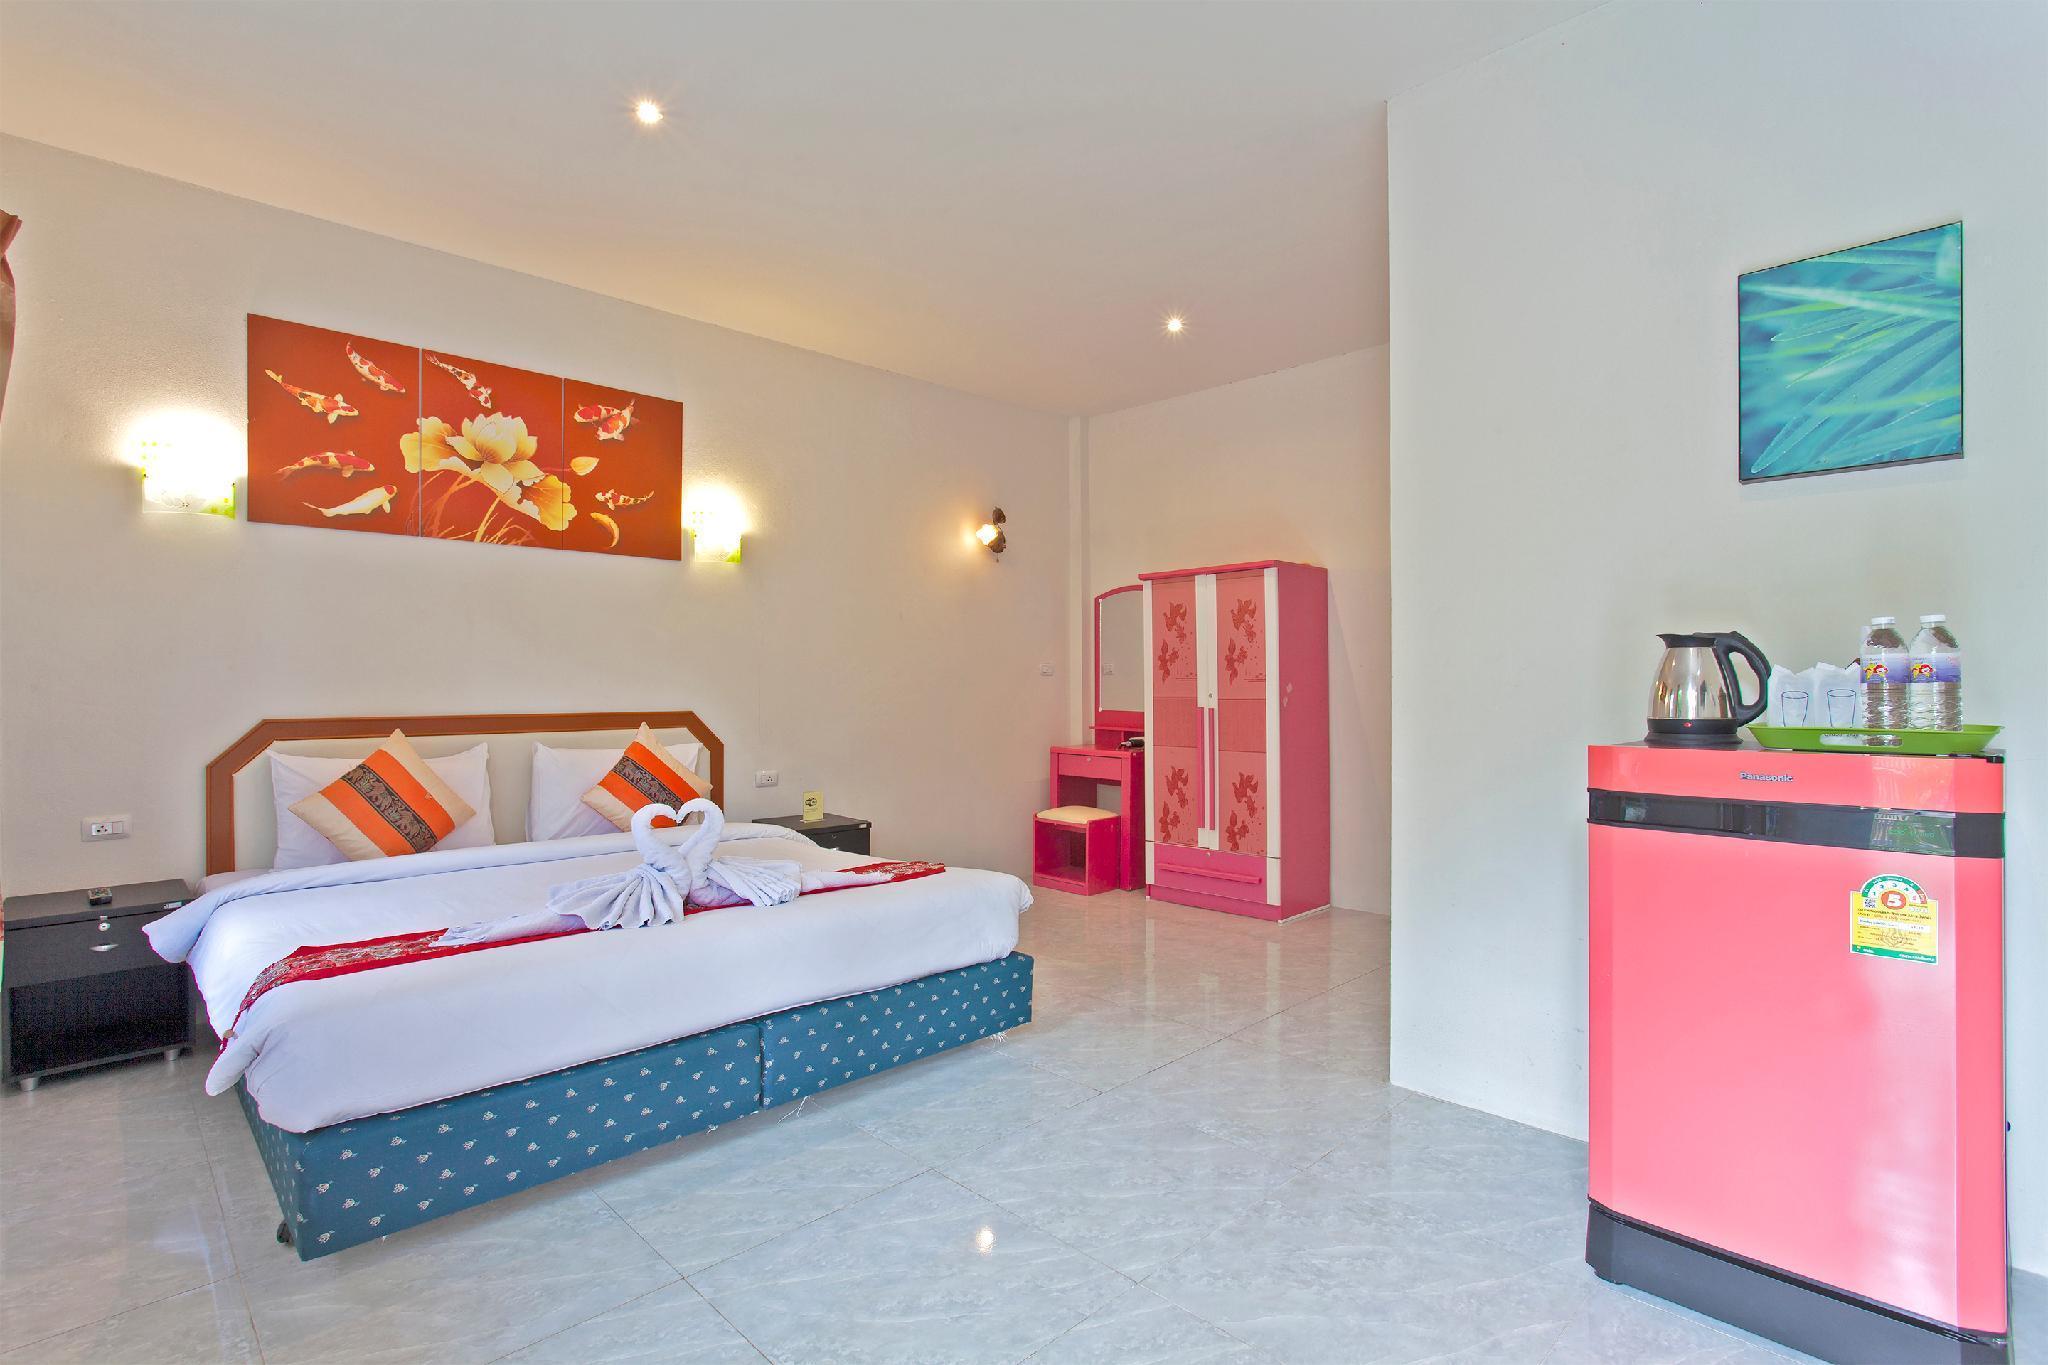 Panorama Villa 12 BR Sleeps 24 w/ Pool near Beach วิลลา 12 ห้องนอน 12 ห้องน้ำส่วนตัว ขนาด 3120 ตร.ม. – สนามบินภูเก็ต